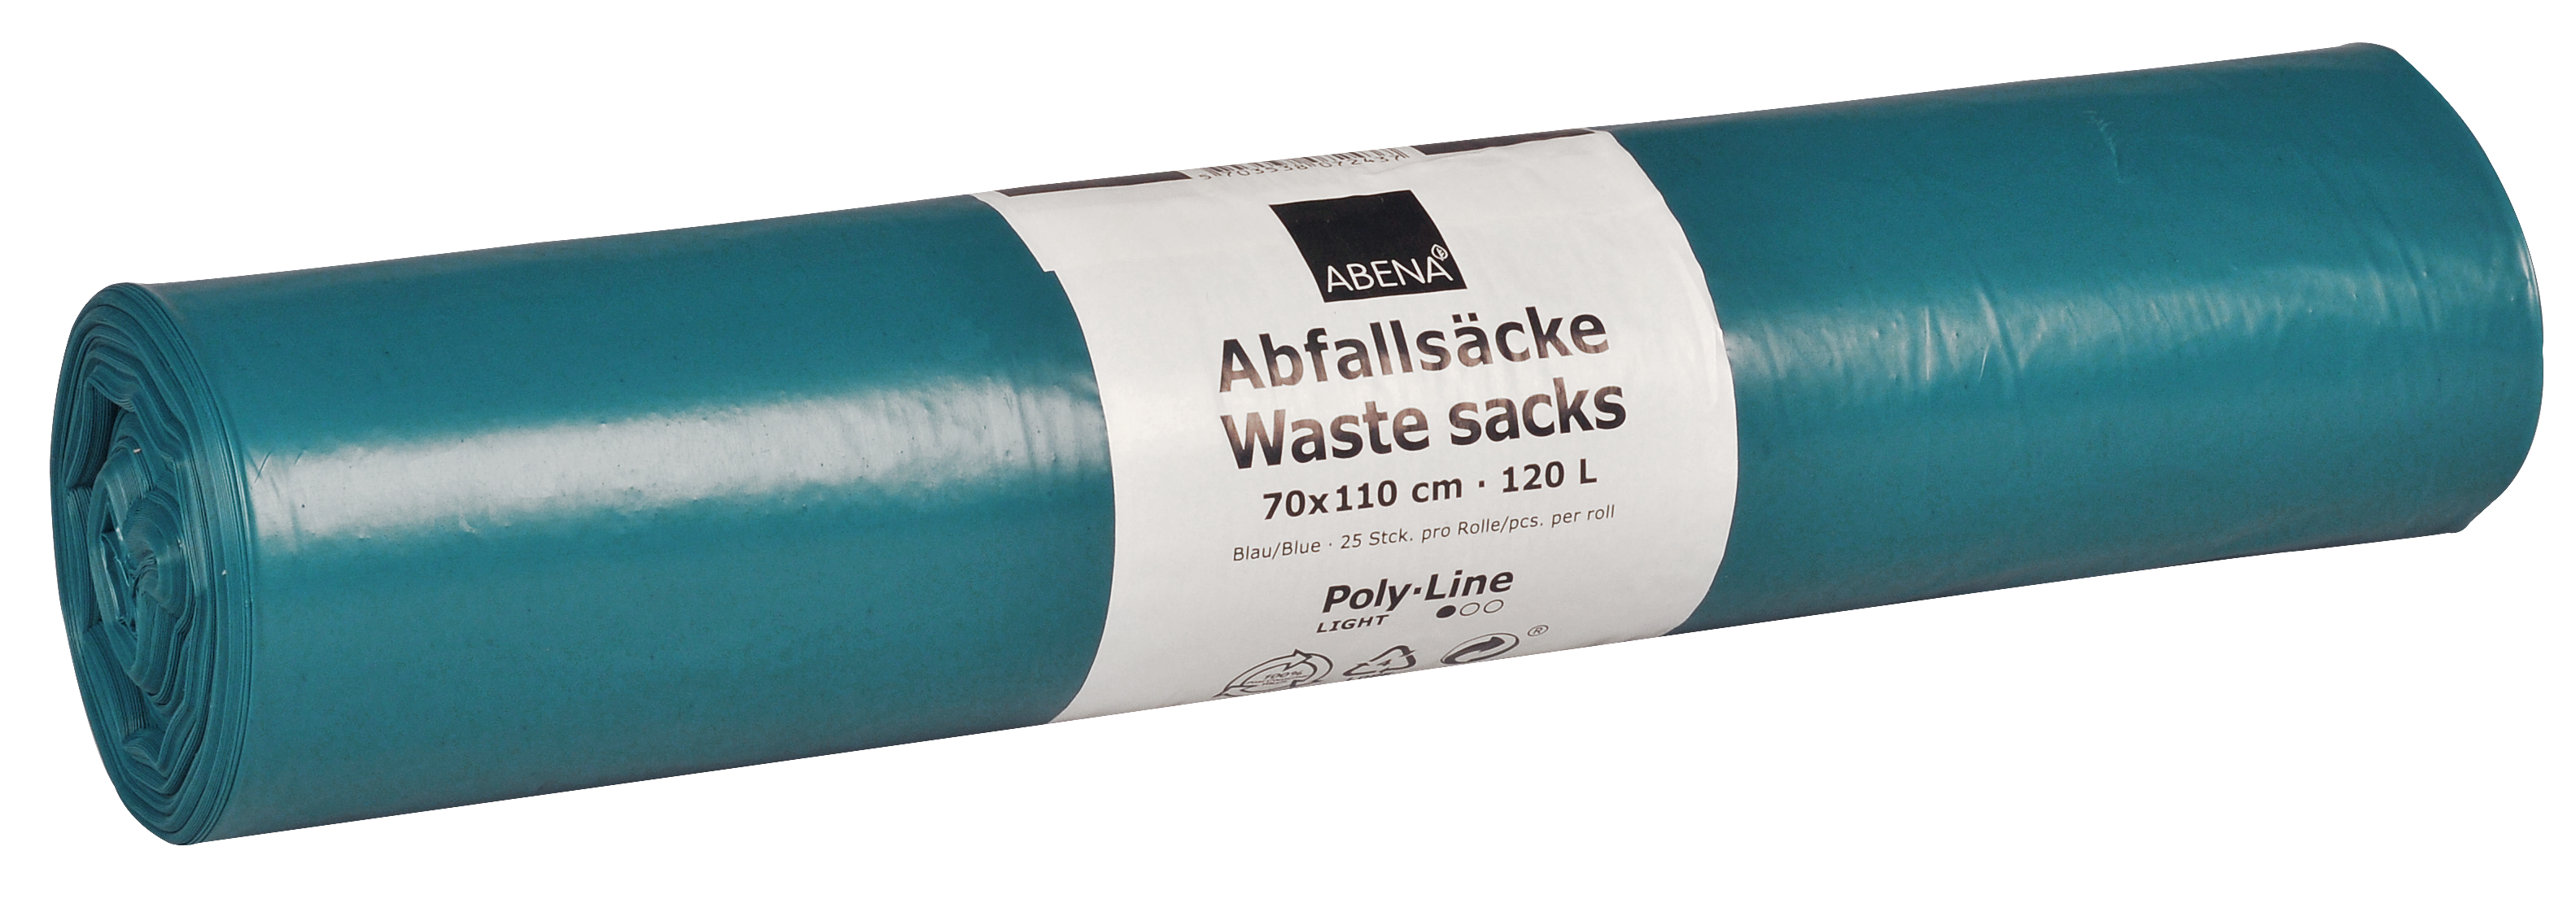 Poly-Line Abfallsack, 34 my, LDPE, 10 x 25 Stück, blau, 70x110cm/ 120 Liter